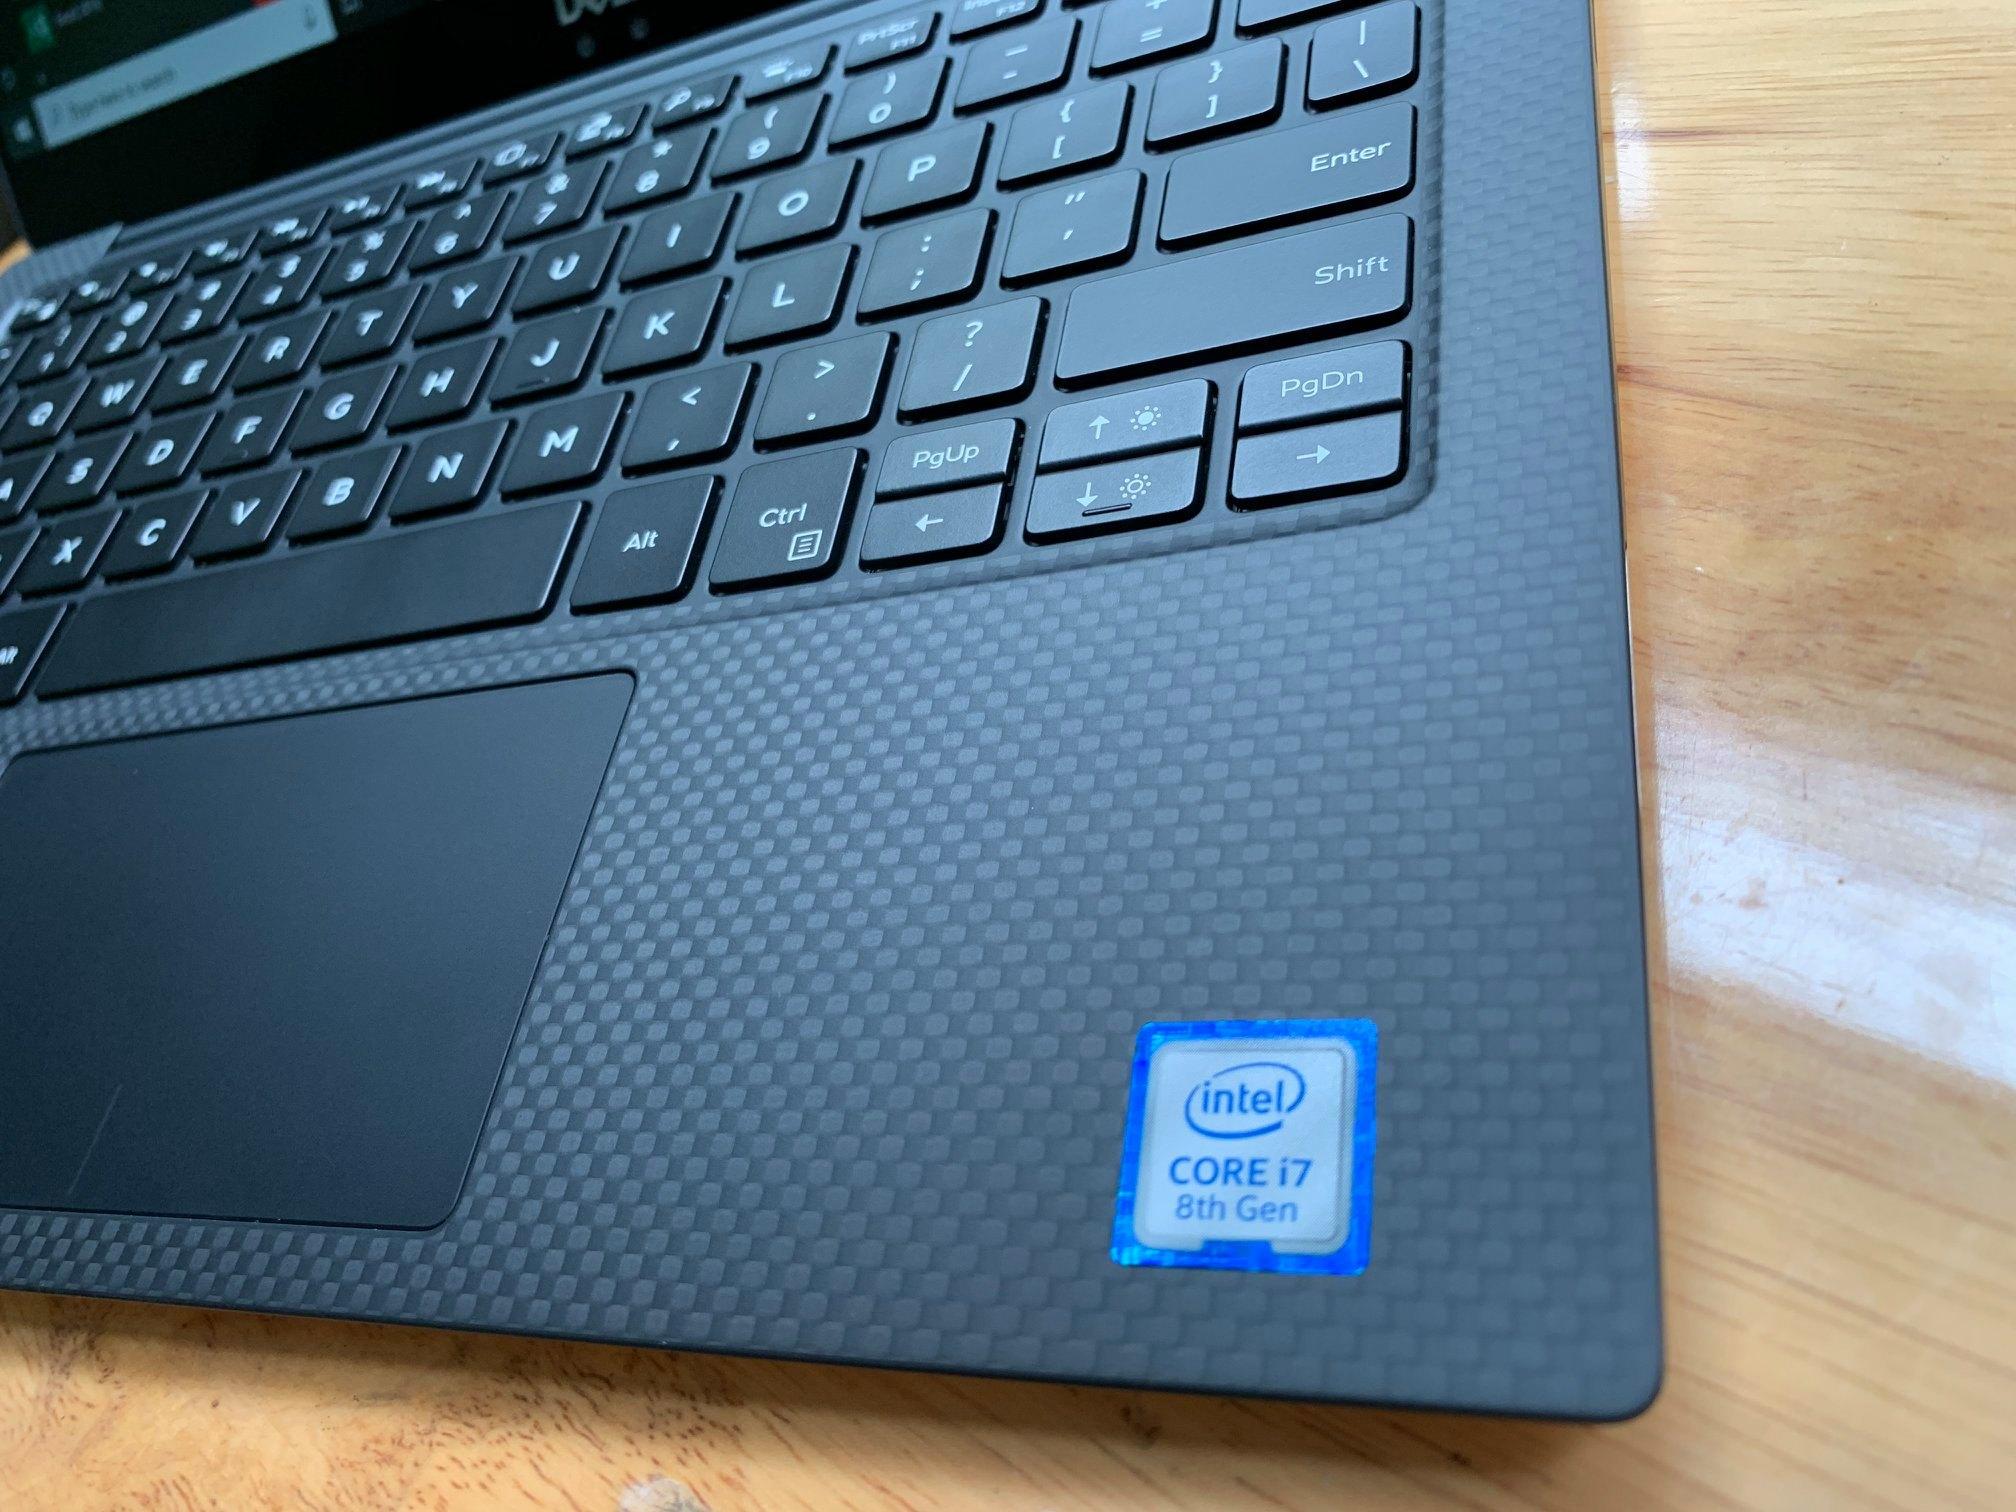 ==> bán 50 cái laptop Dell ... Core i3, i5, i7 ...máy đẹp, zin all. - 15